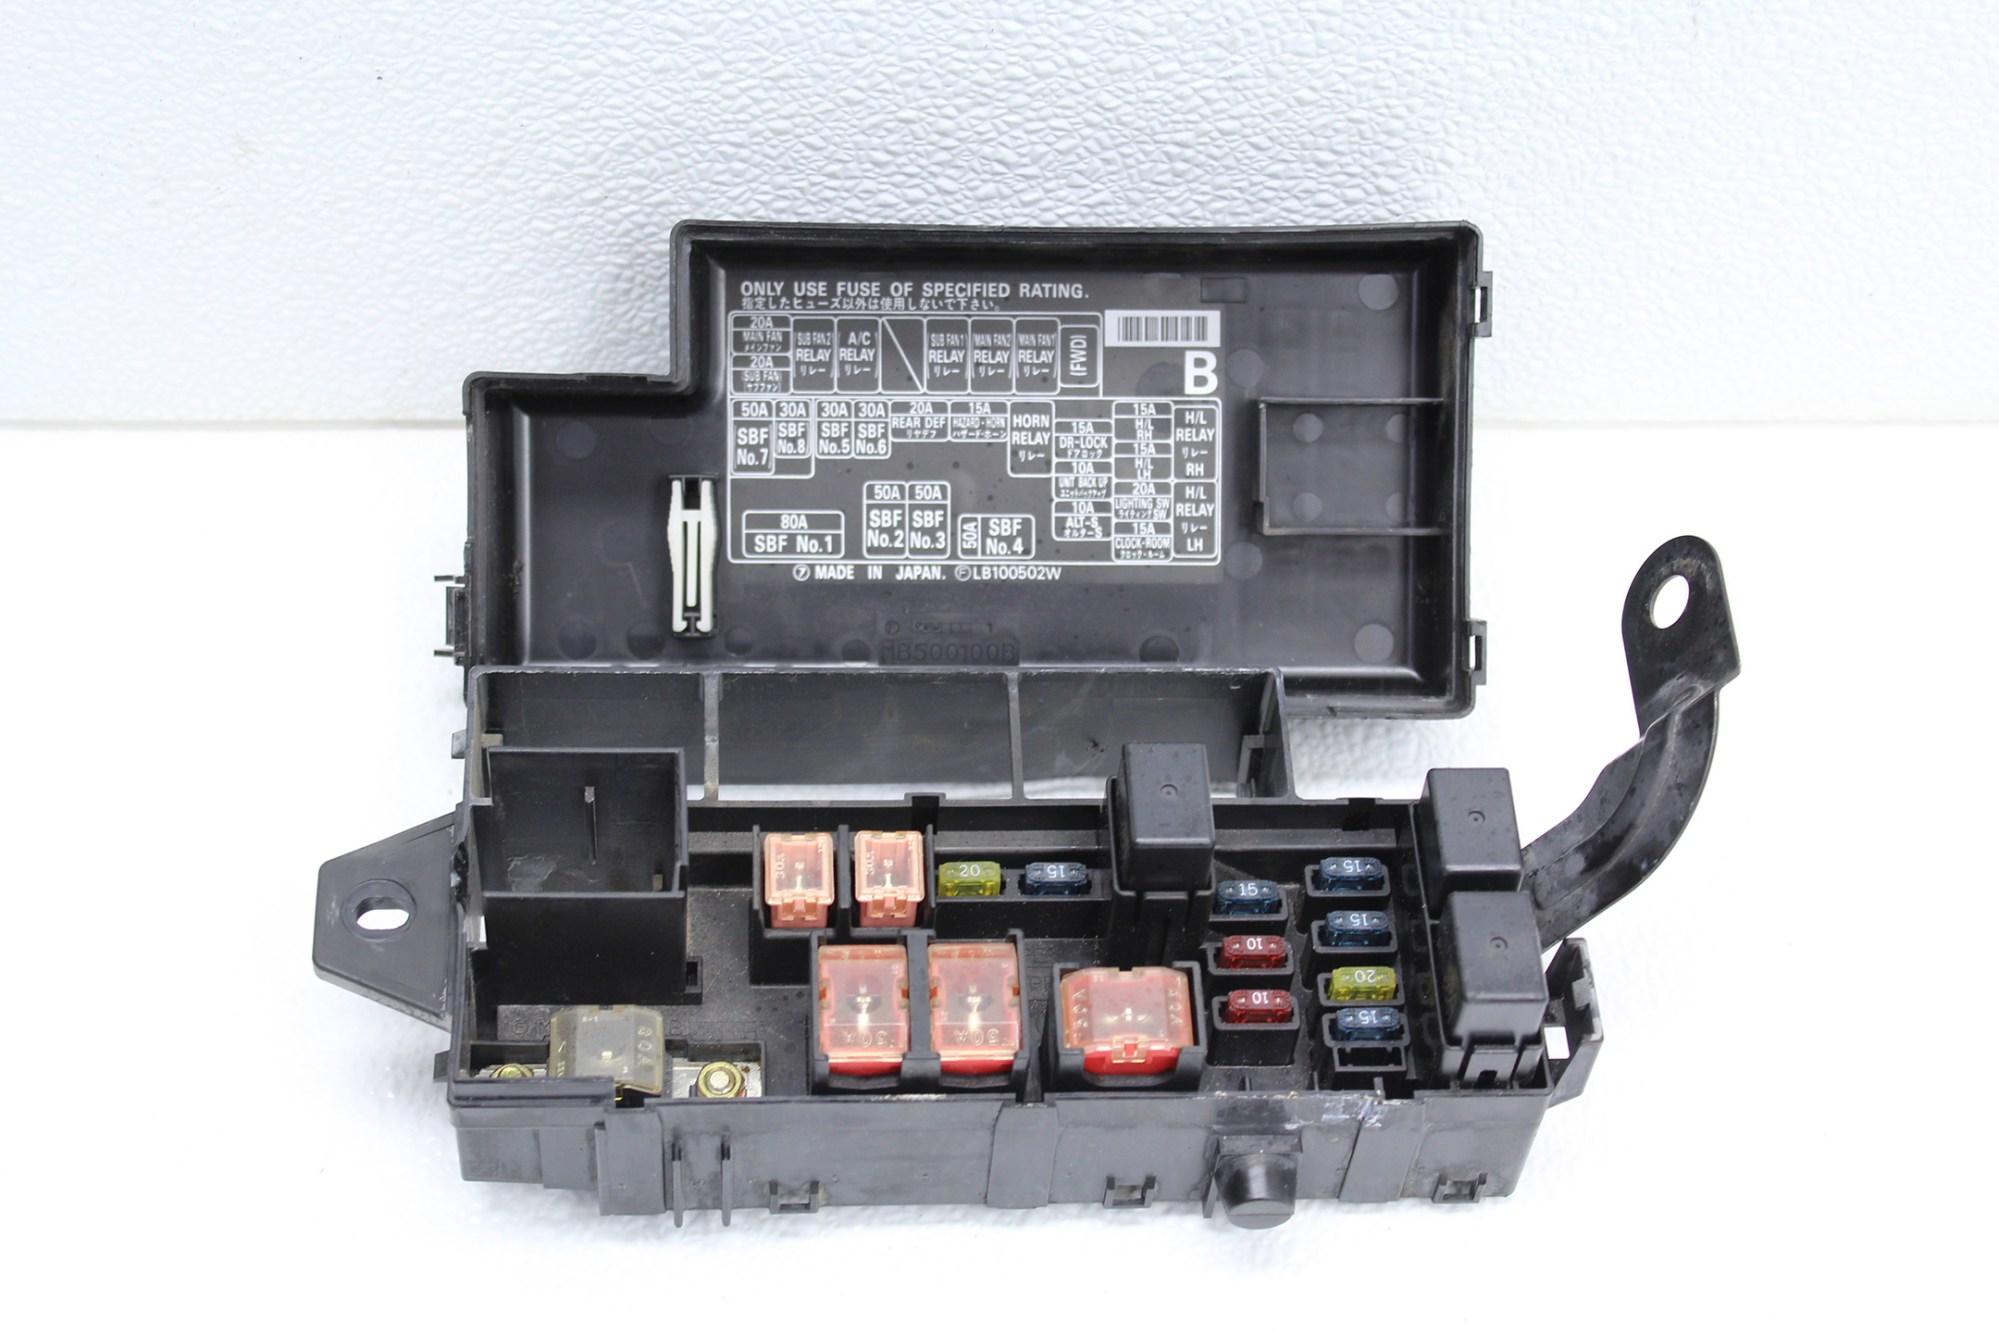 hight resolution of subaru impreza gc8 fuse box wiring diagram schema mix 1998 2001 subaru impreza 2 5 rs